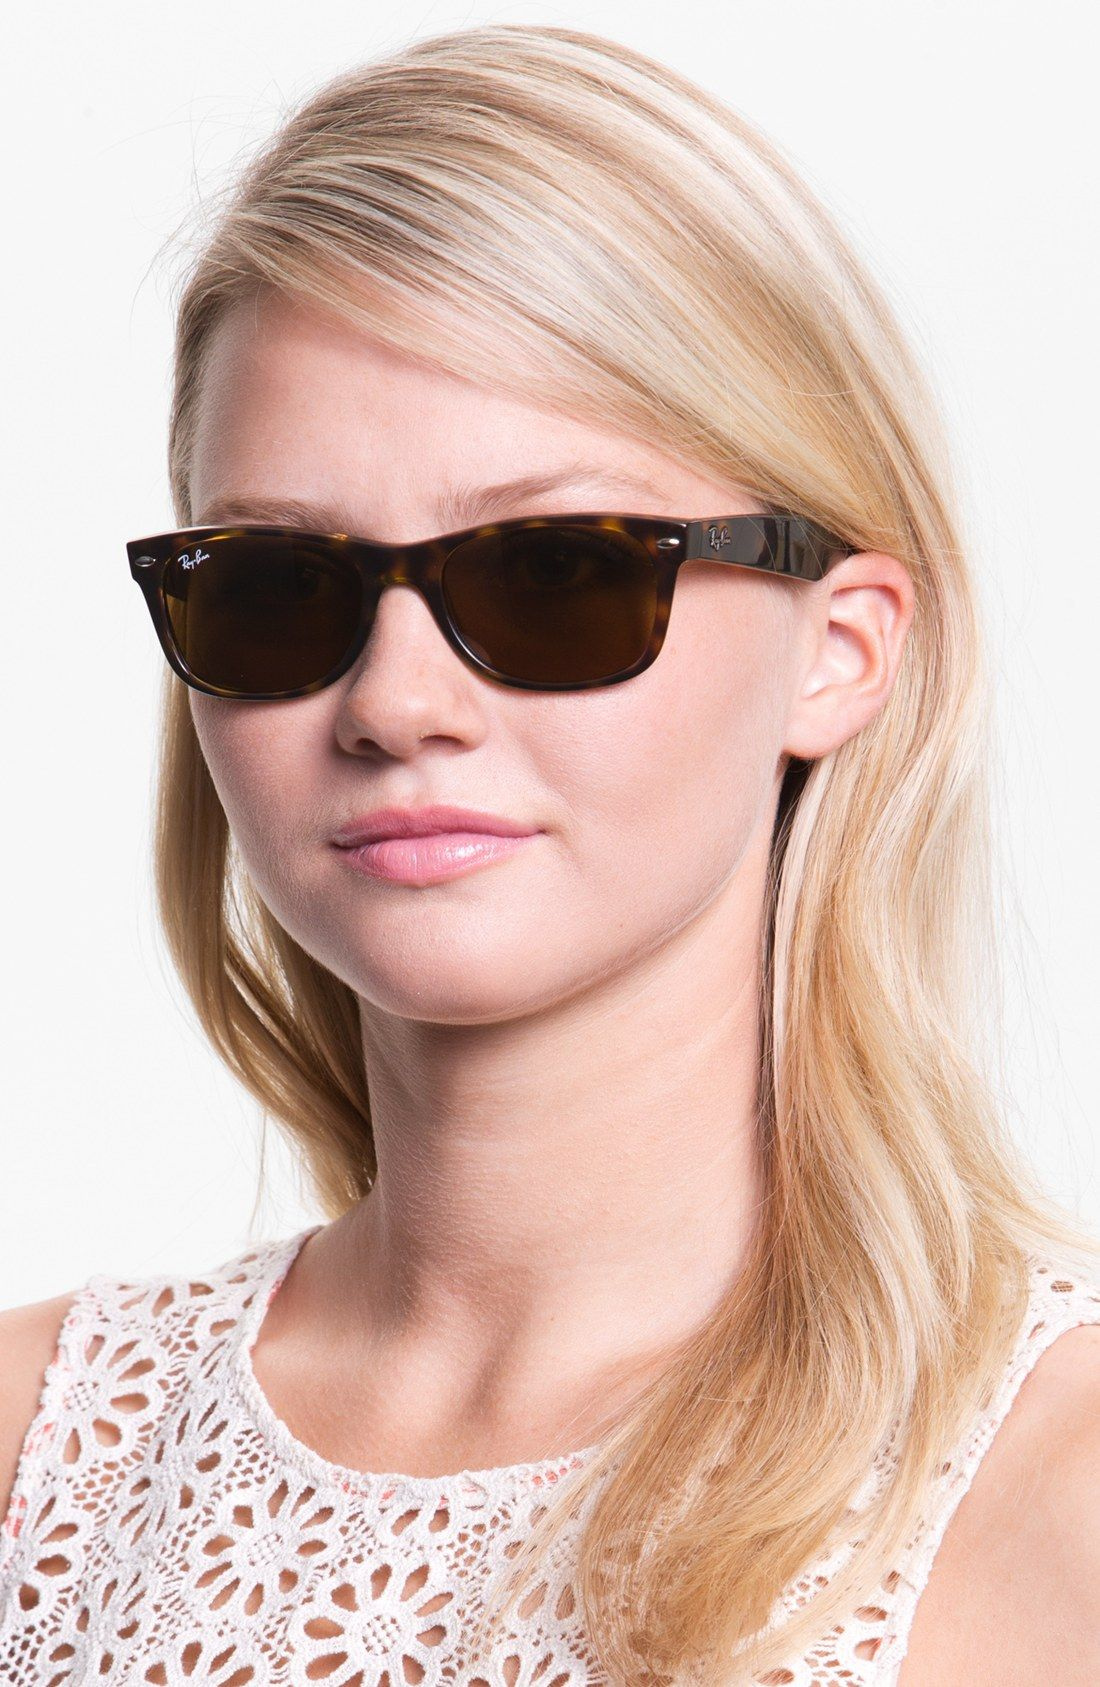 6b1679dc95fe mens ray ban aviator sunglasses,ray ban sunglasses womens,ray ban optical  glasses,womens ray ban aviators www.shoppingoutlets88.com